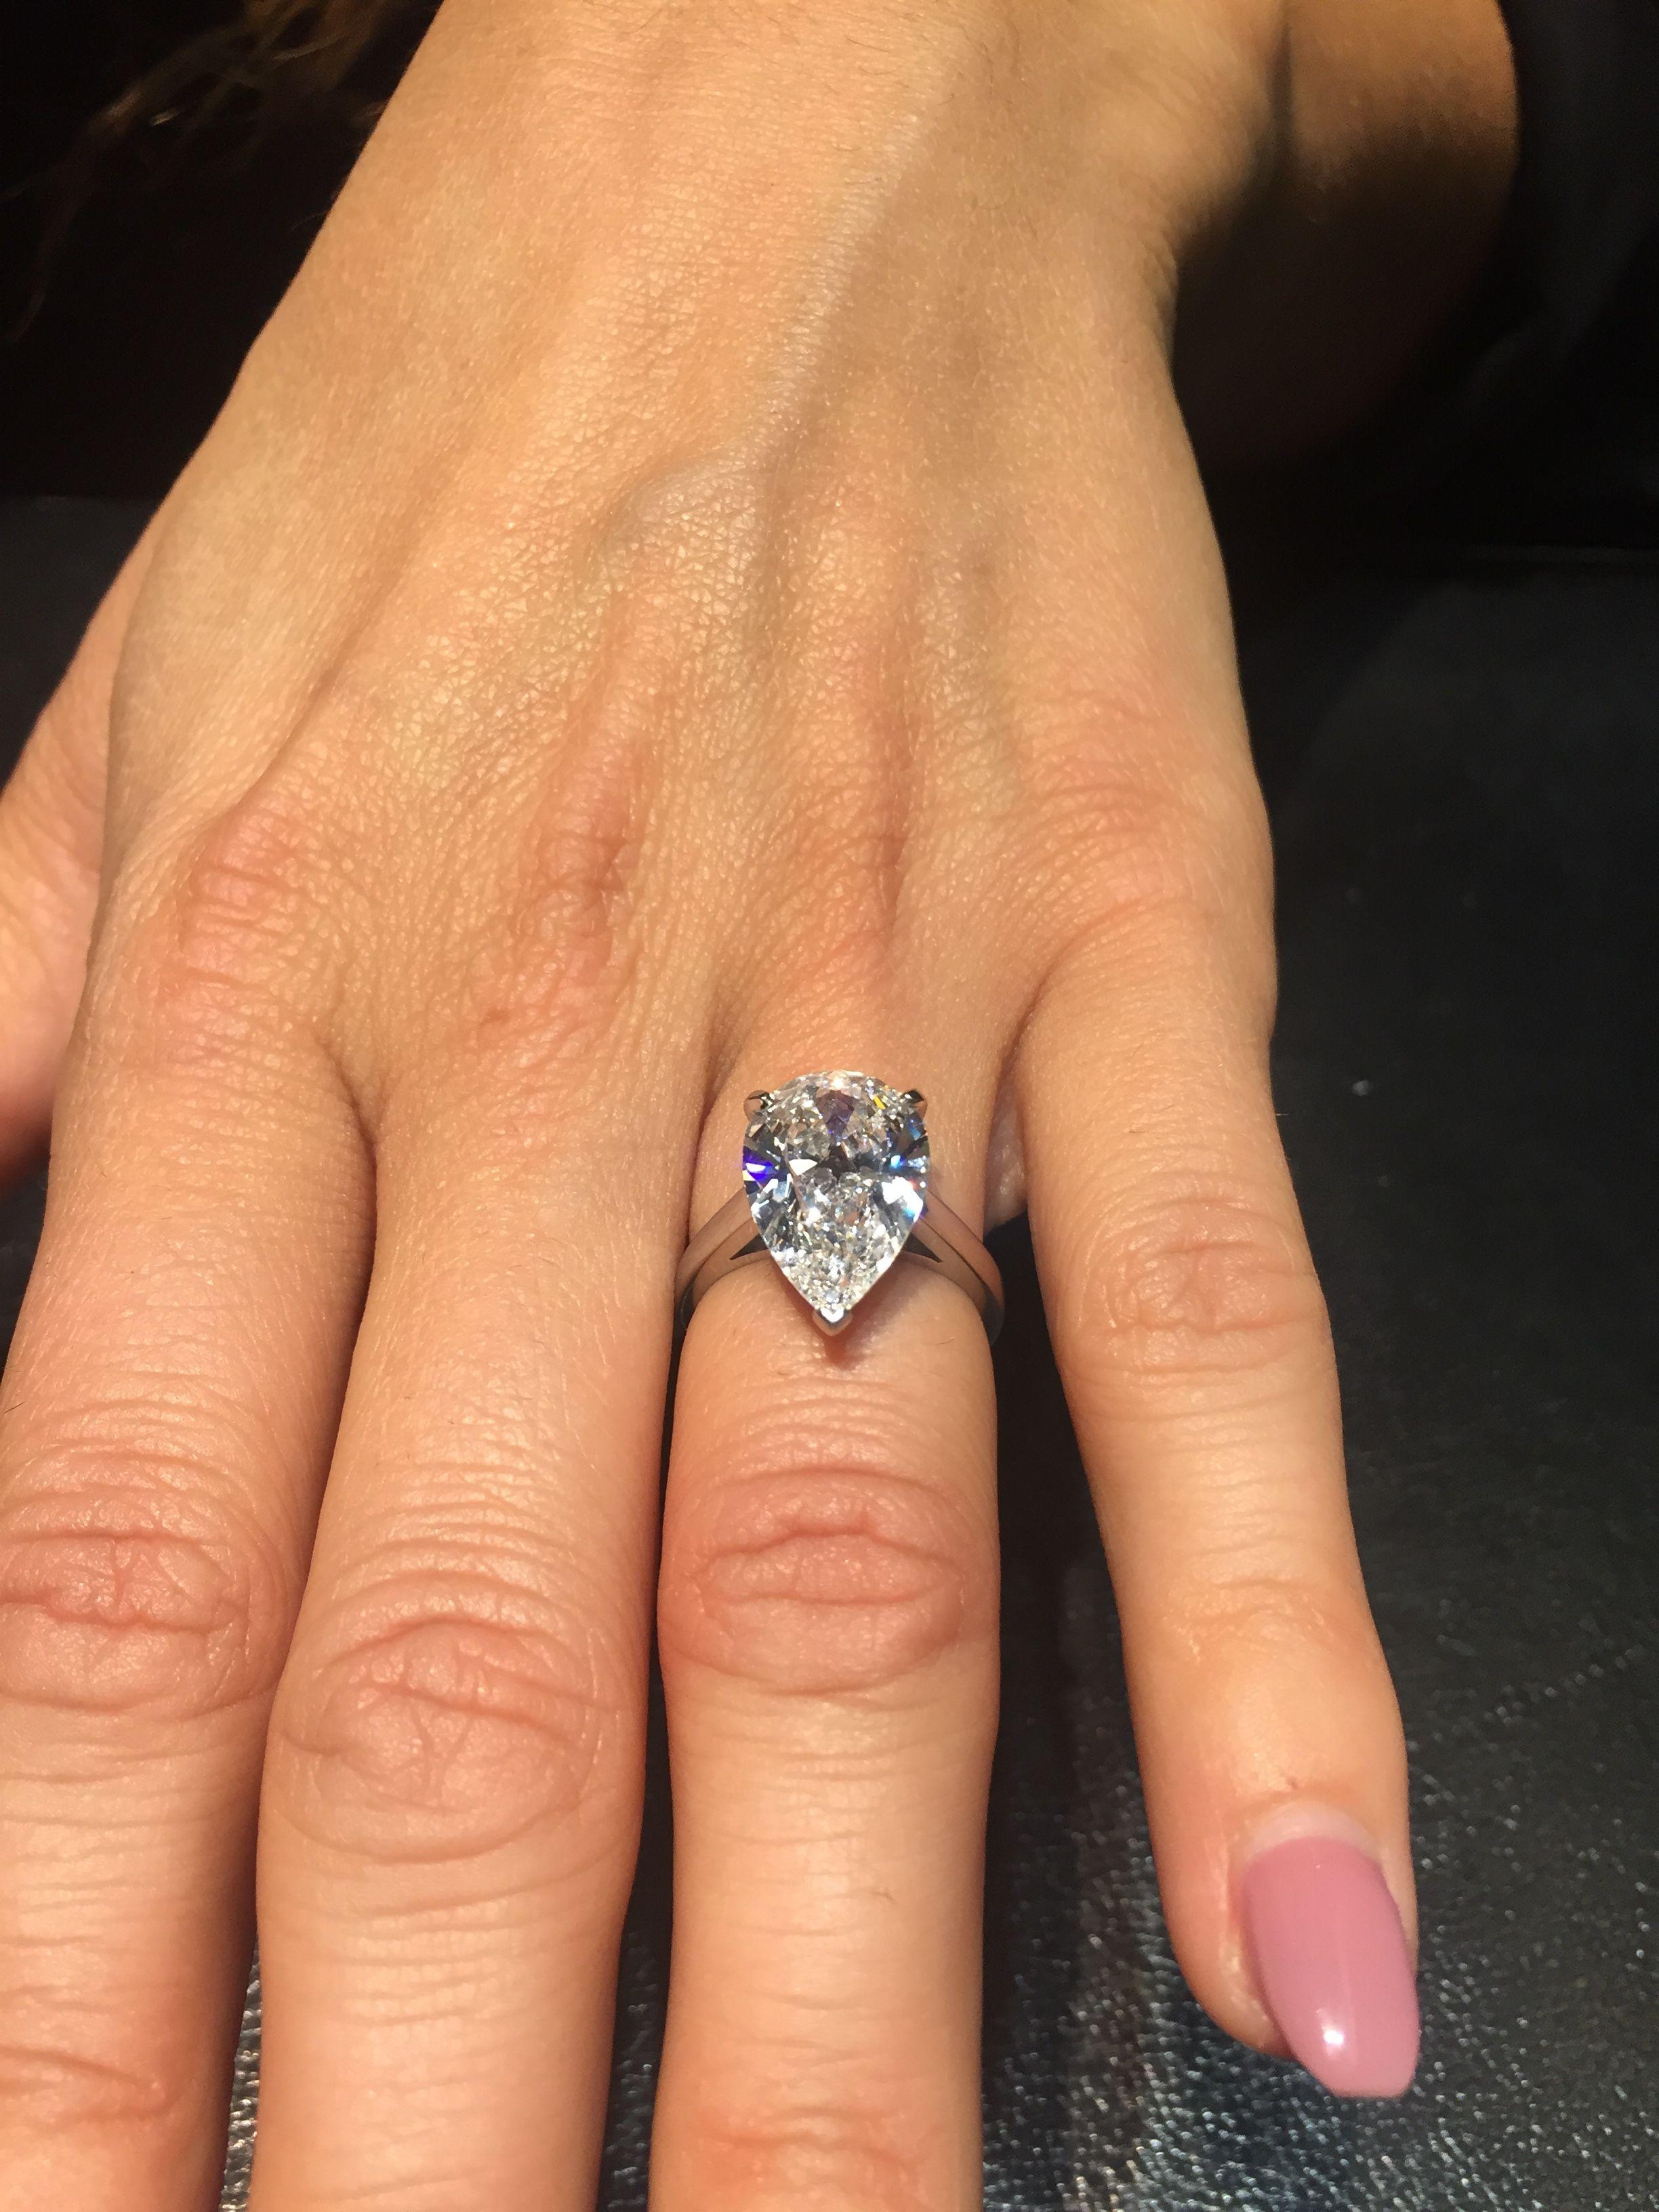 6 Carat Pear Diamond Engagement Ring 647 000 Prettys In